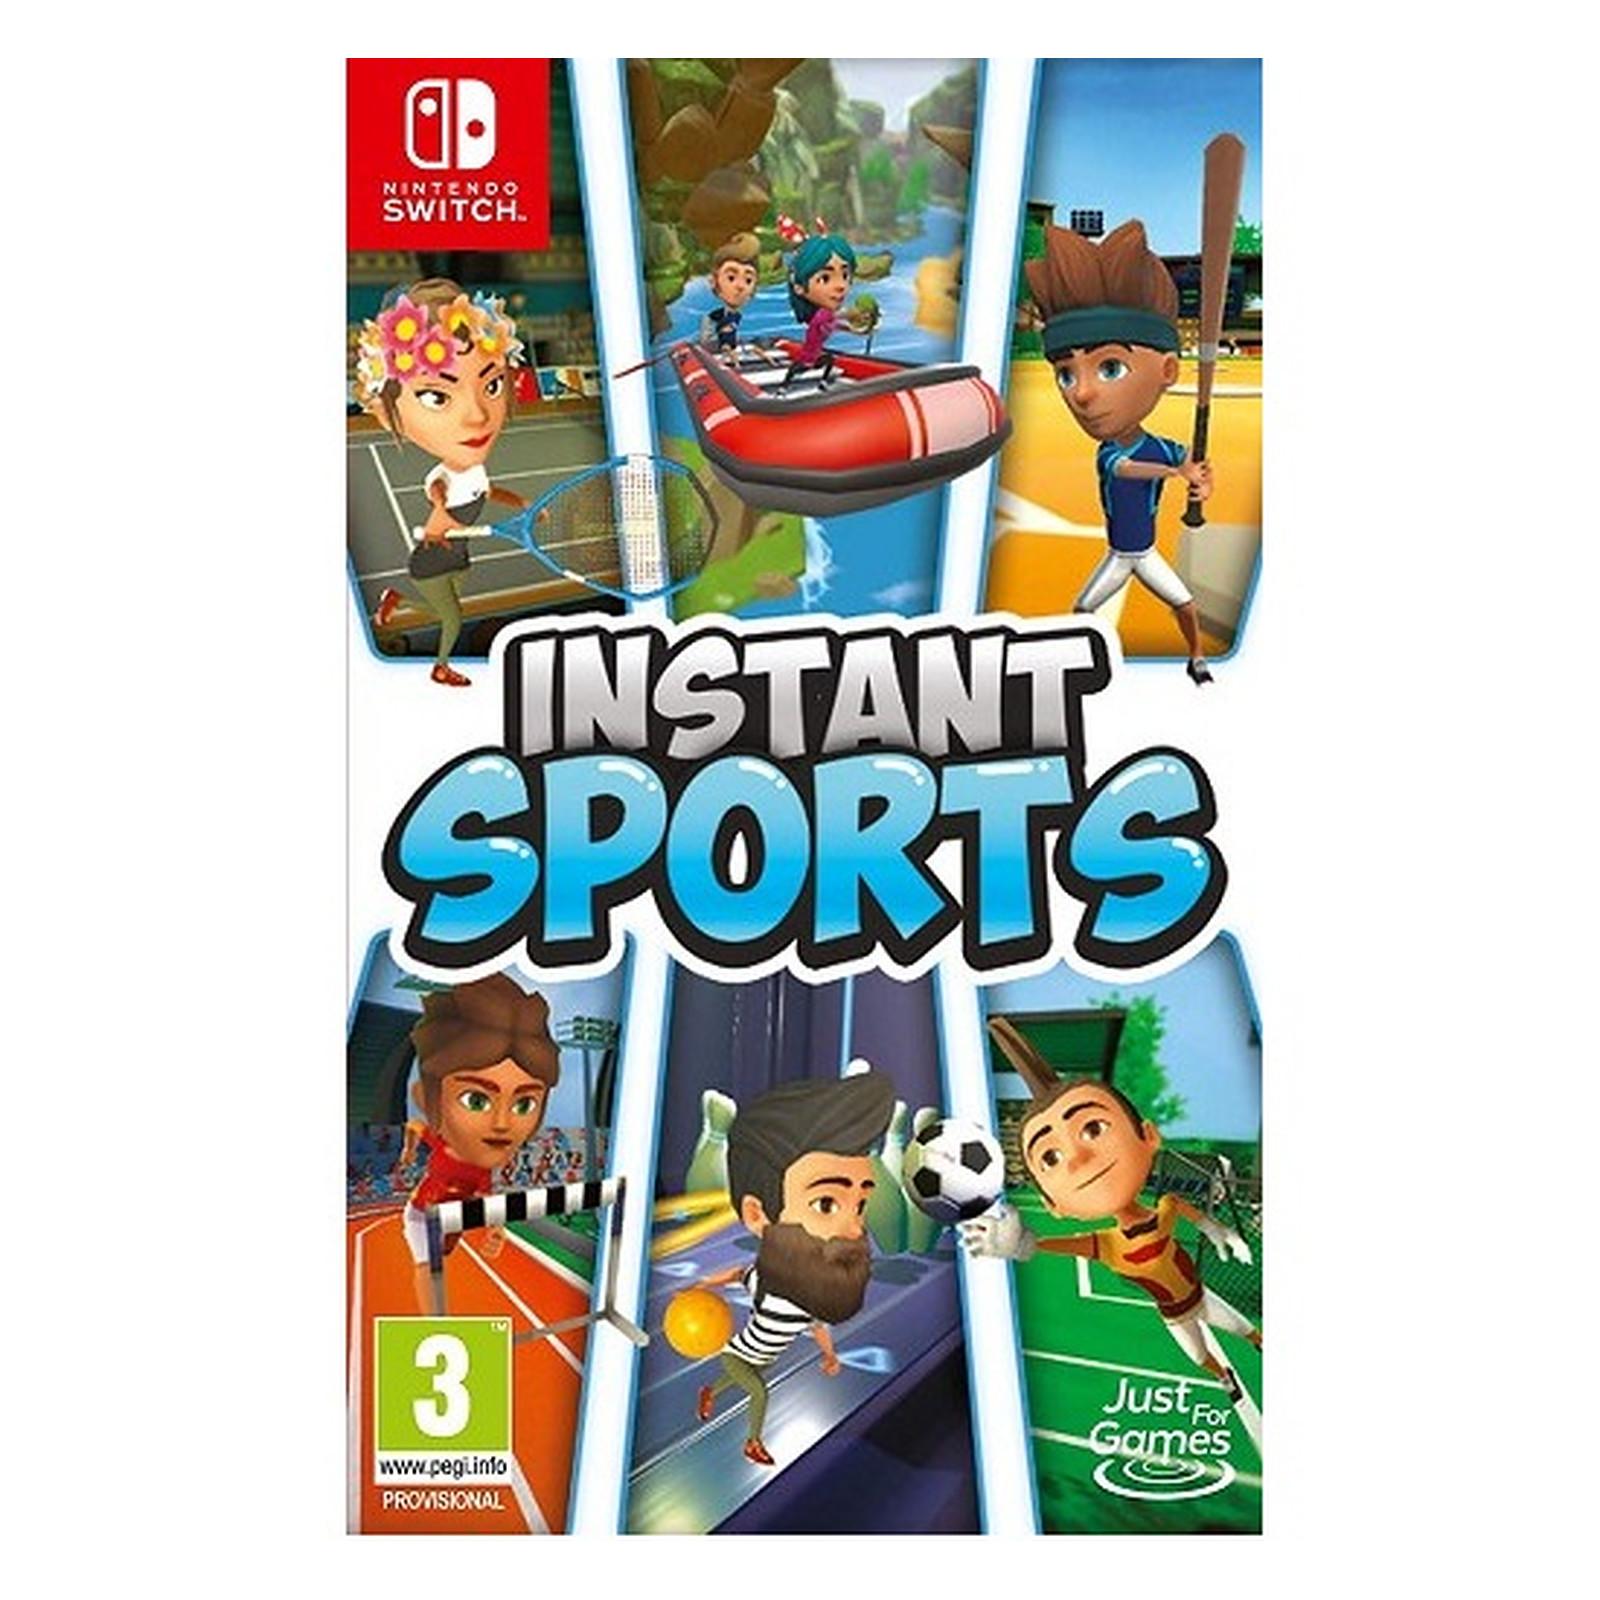 Instant Sports (SWITCH)